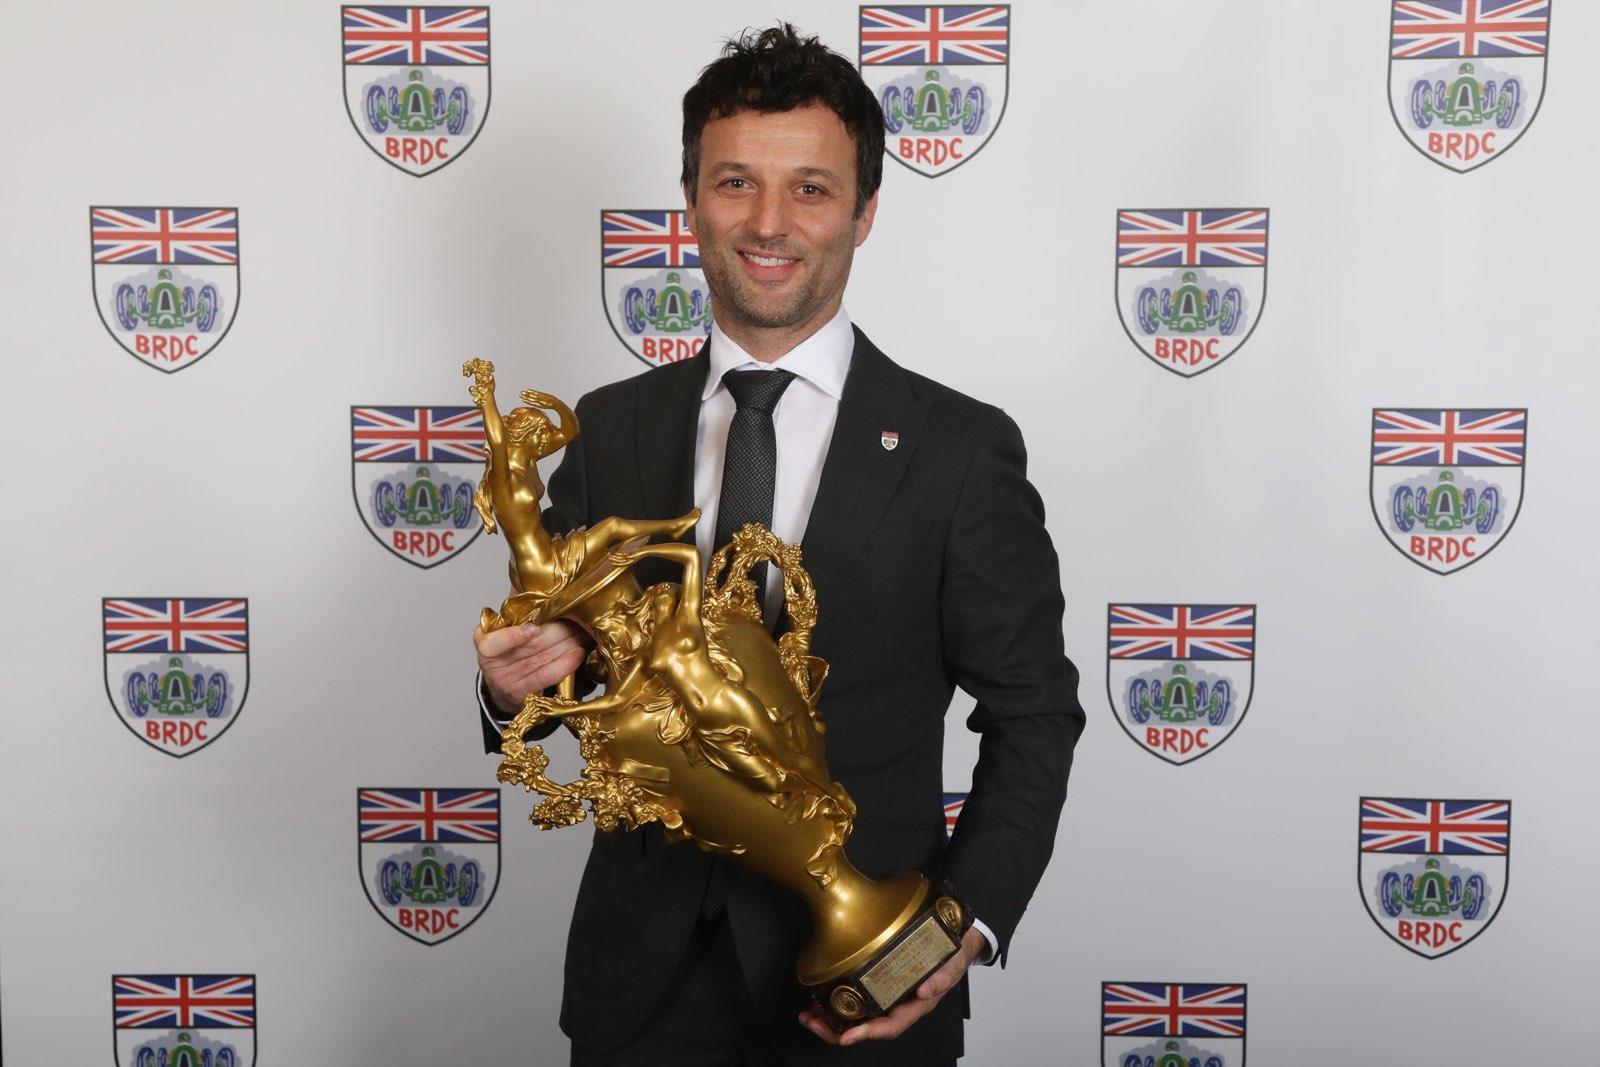 Grange Ambassador Darren Turner receives prestigious BRDC award